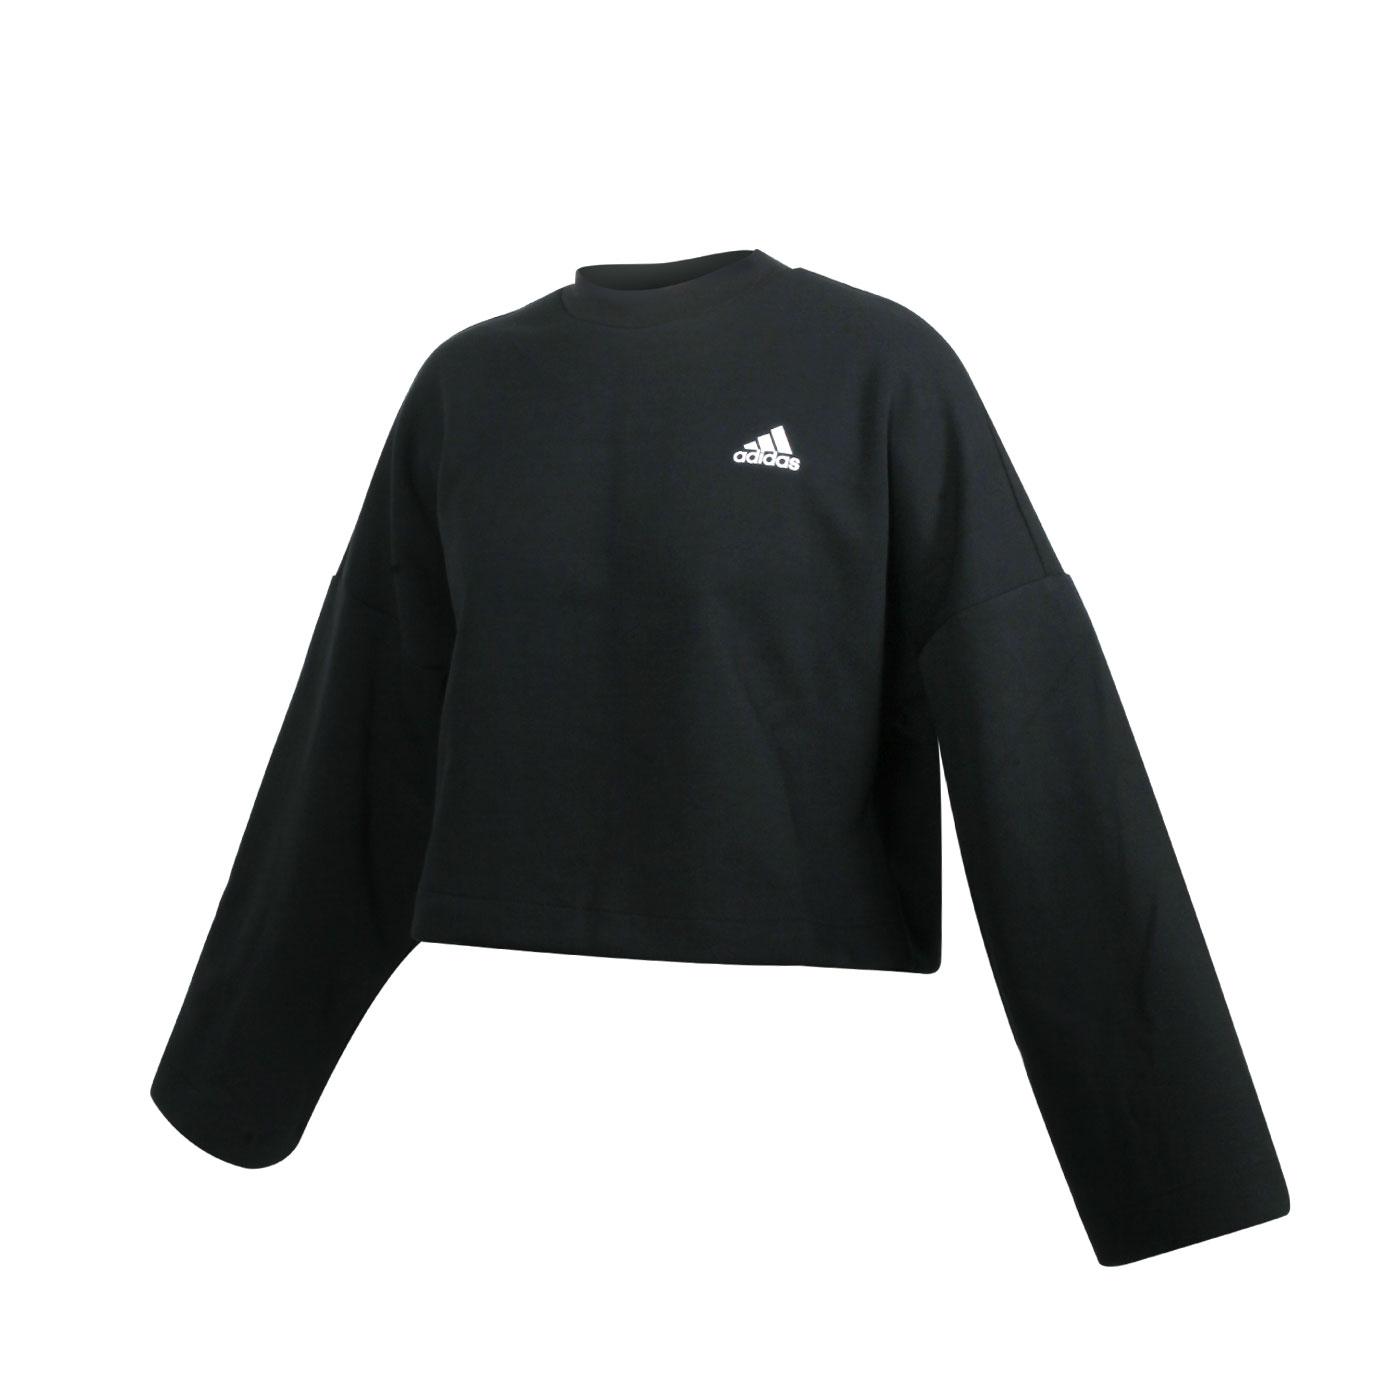 ADIDAS 女款長袖T恤 GC6943